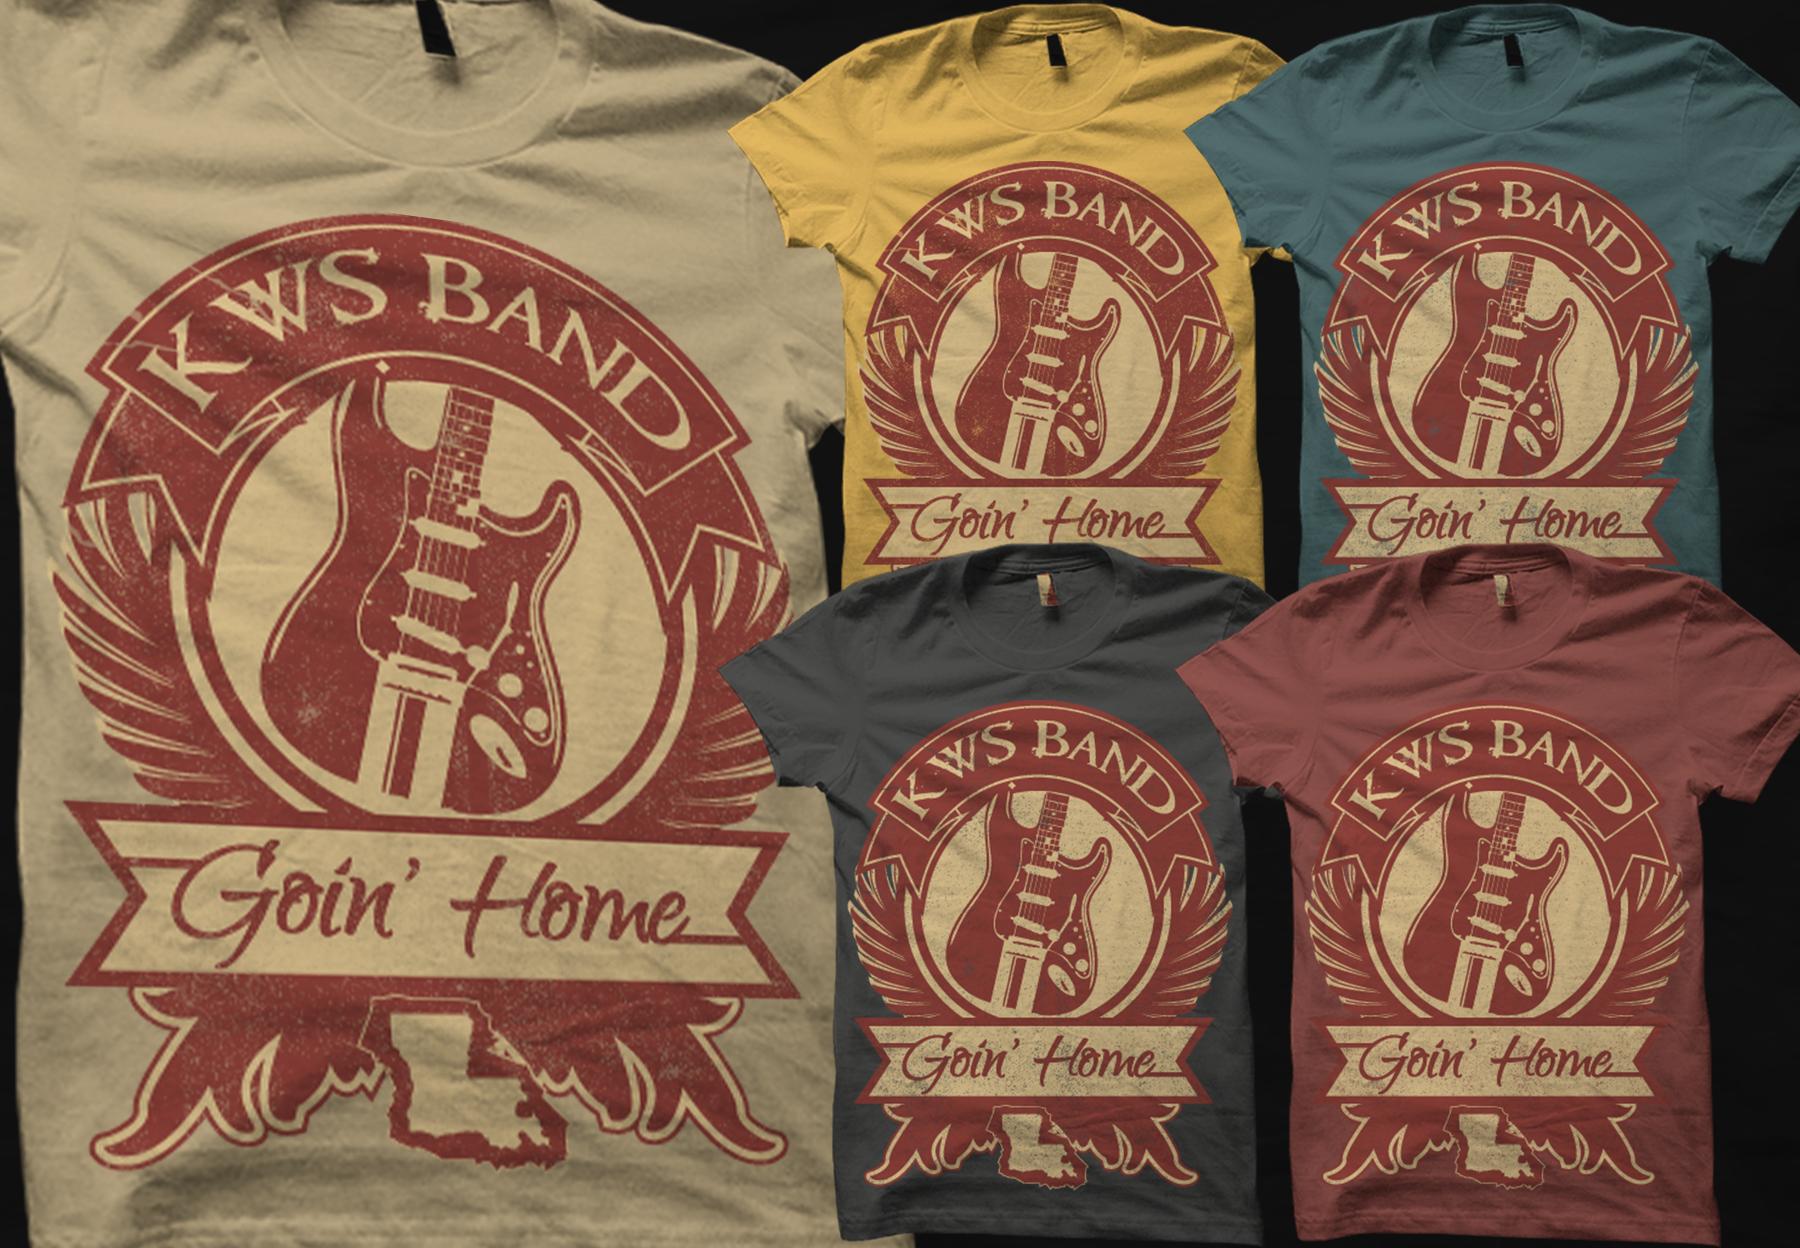 Kenny Wayne Shepherd Goin' Home T-Shirt Contest